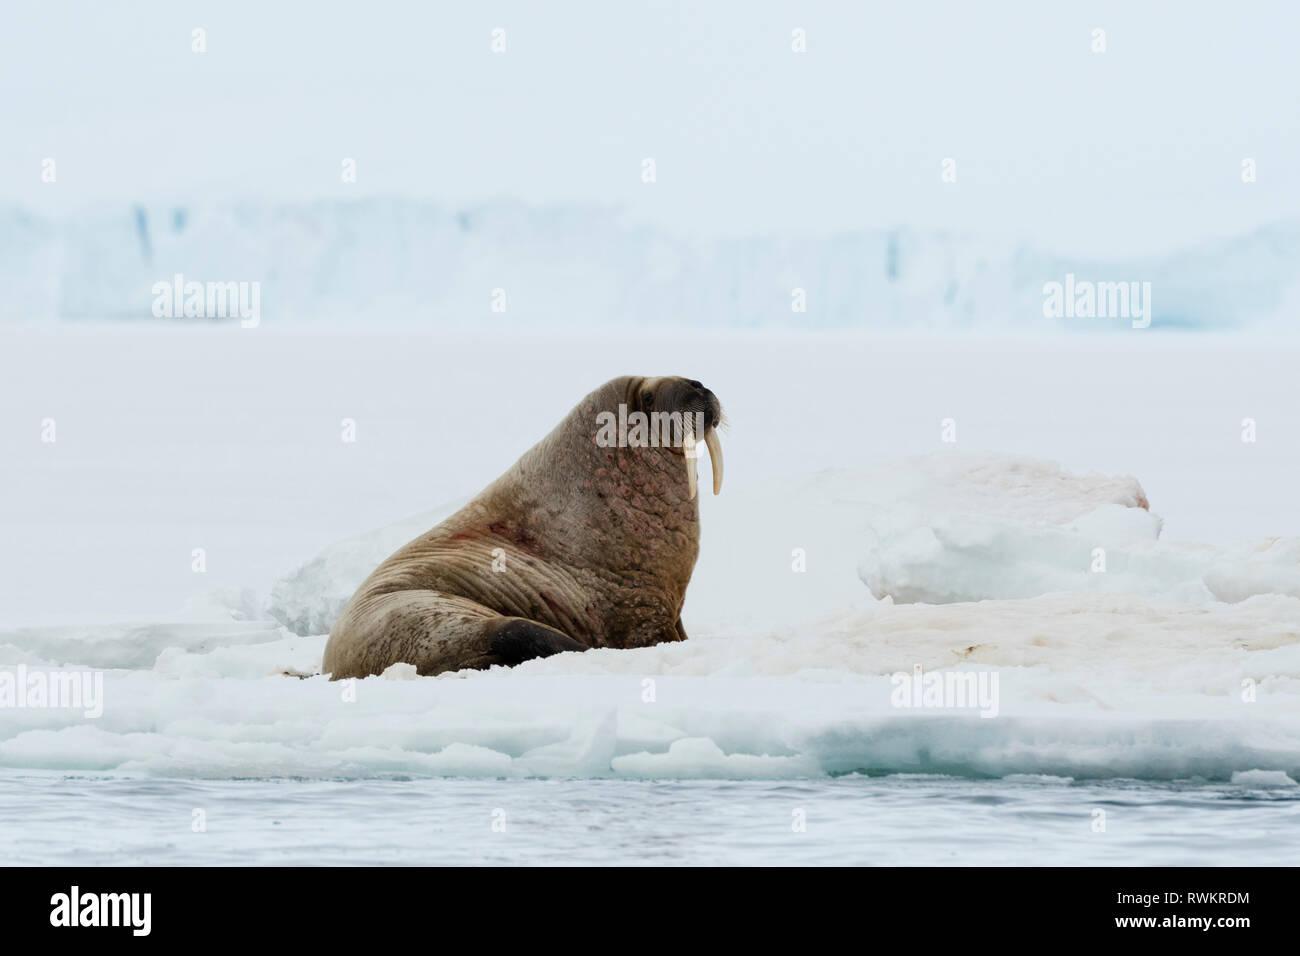 Atlantic walrus (Odobenus rosmarus) on iceberg,  Vibebukta, Austfonna, Nordaustlandet, Svalbard, Norway Stock Photo